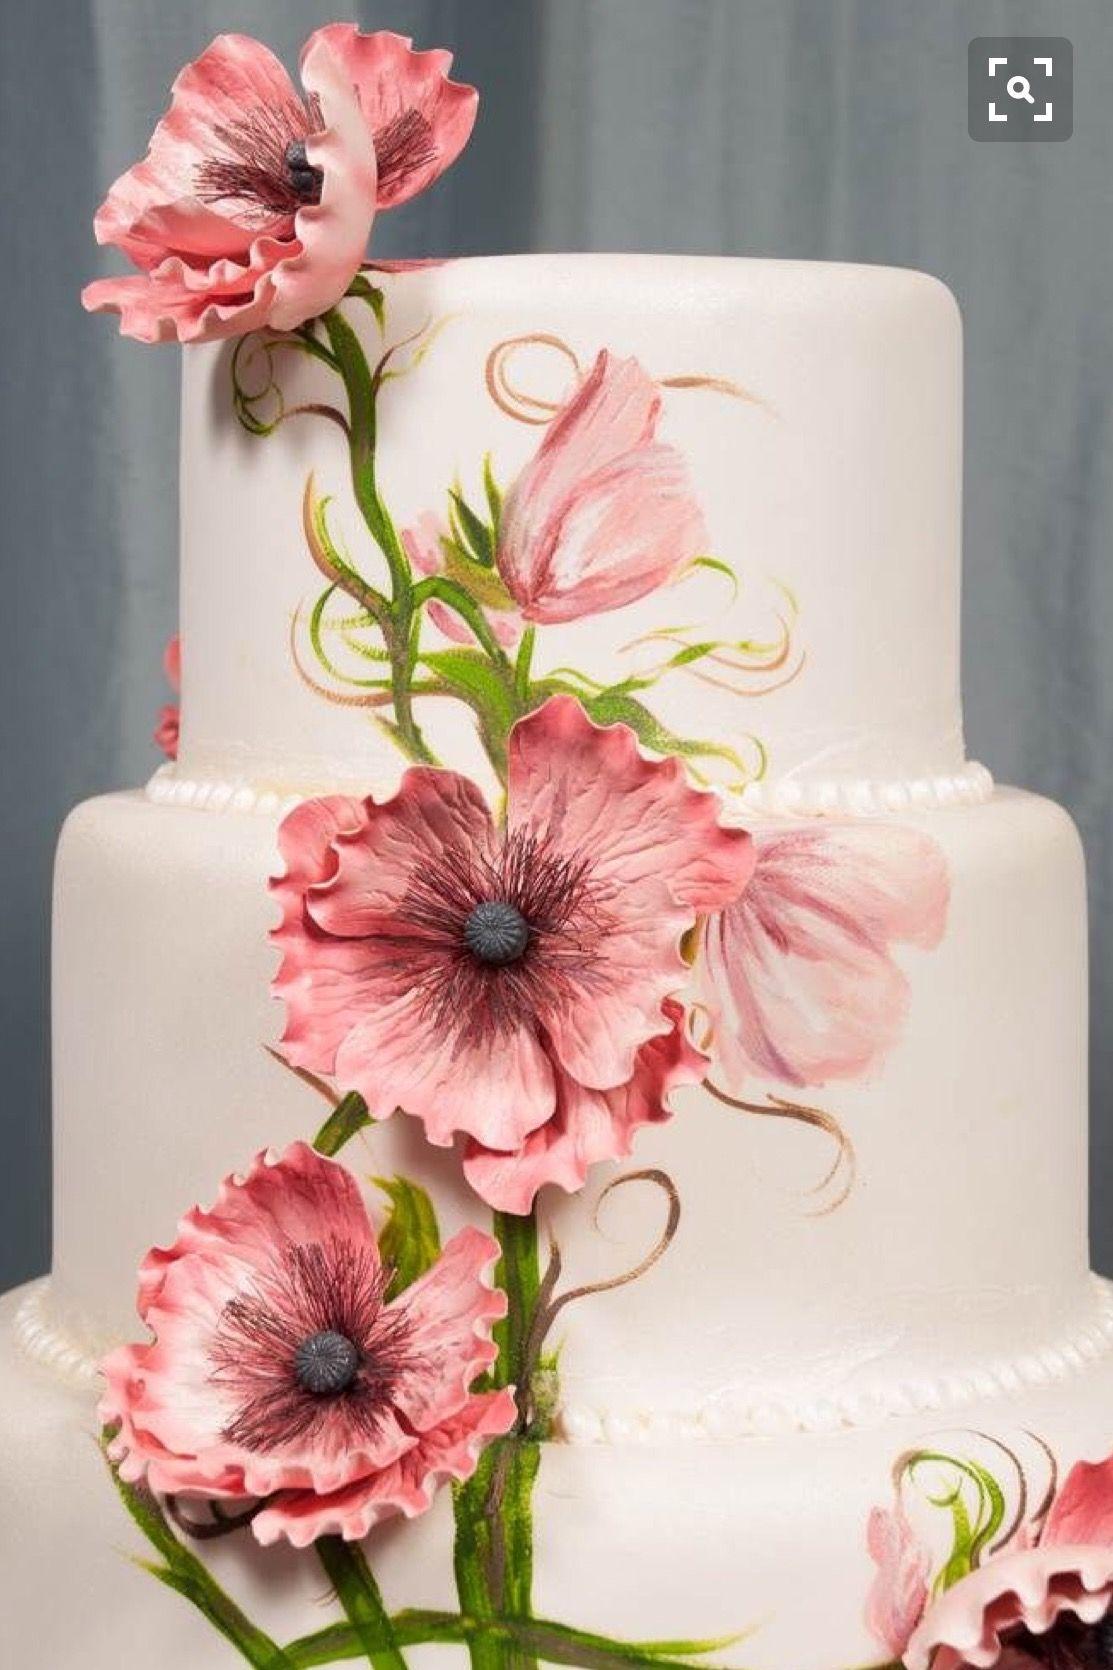 Pin by Theresa Buckner Richburg on cake | Pinterest | Cake, Wedding ...